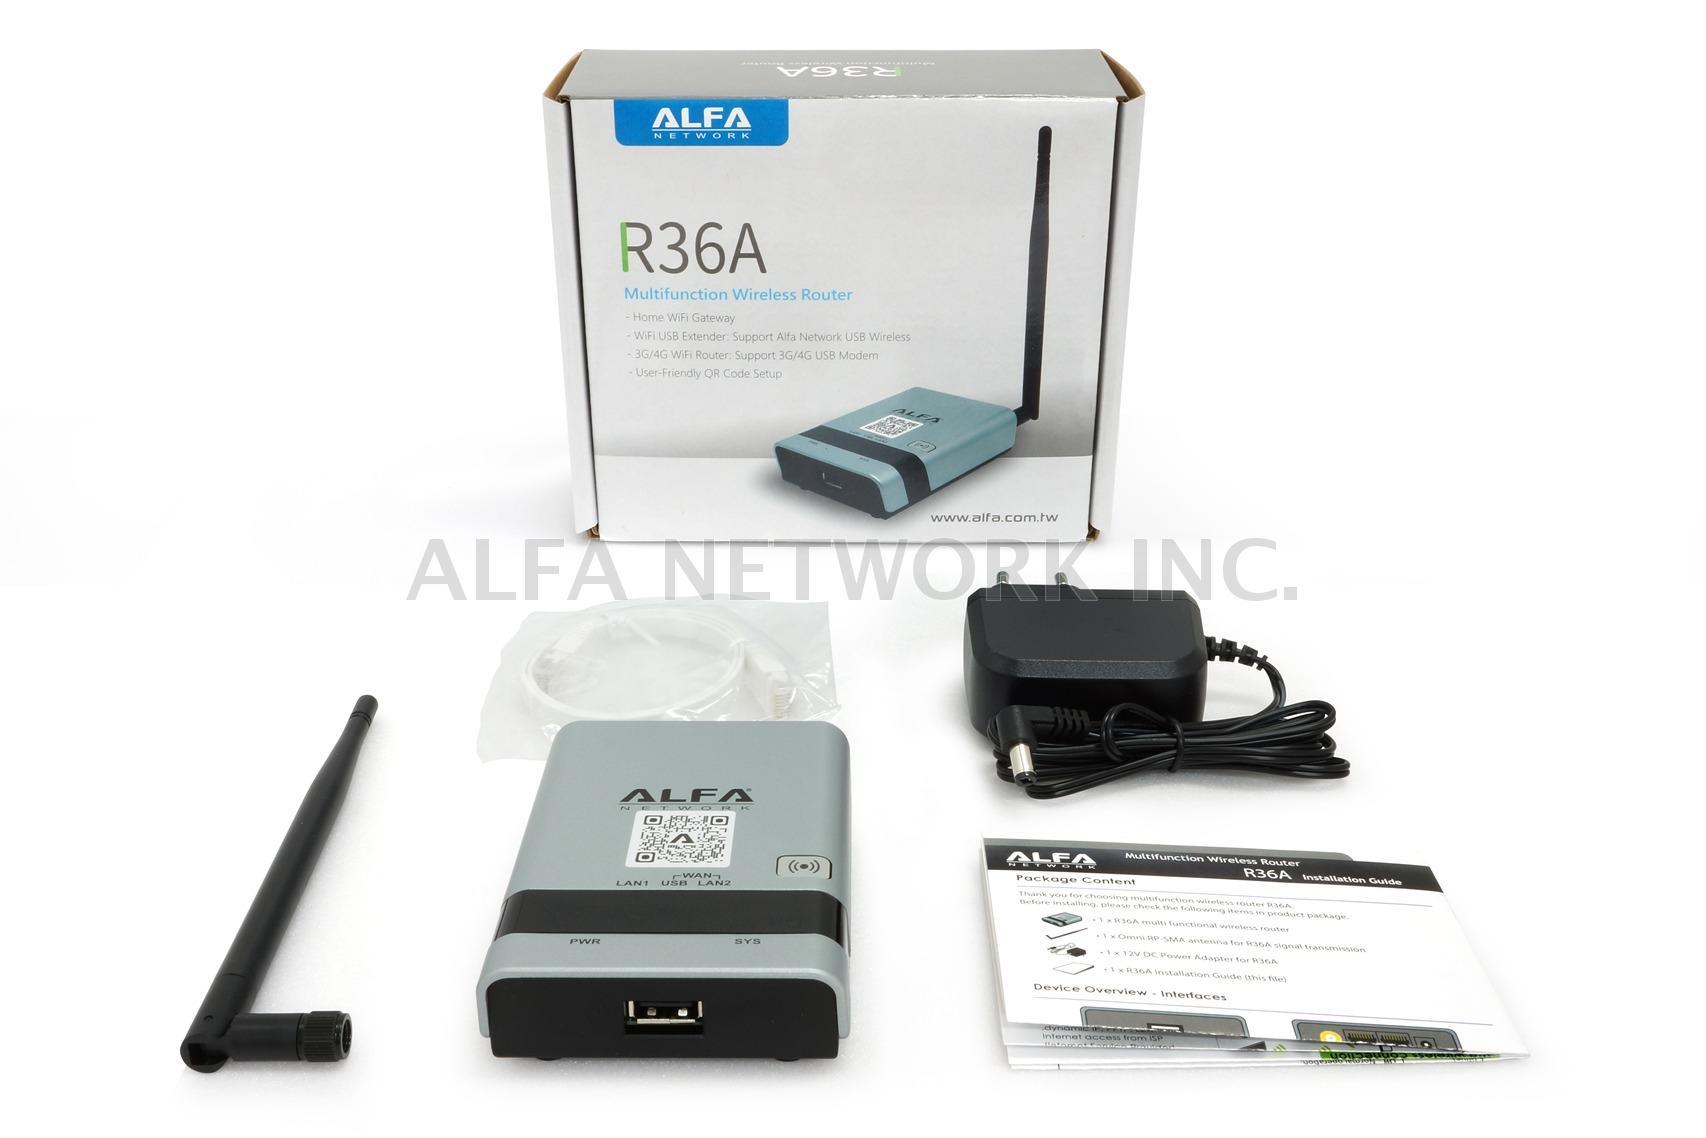 Taiwan ALFA R36A WiFi USB & 4G Modem Extender Router | ALFA NETWORK INC